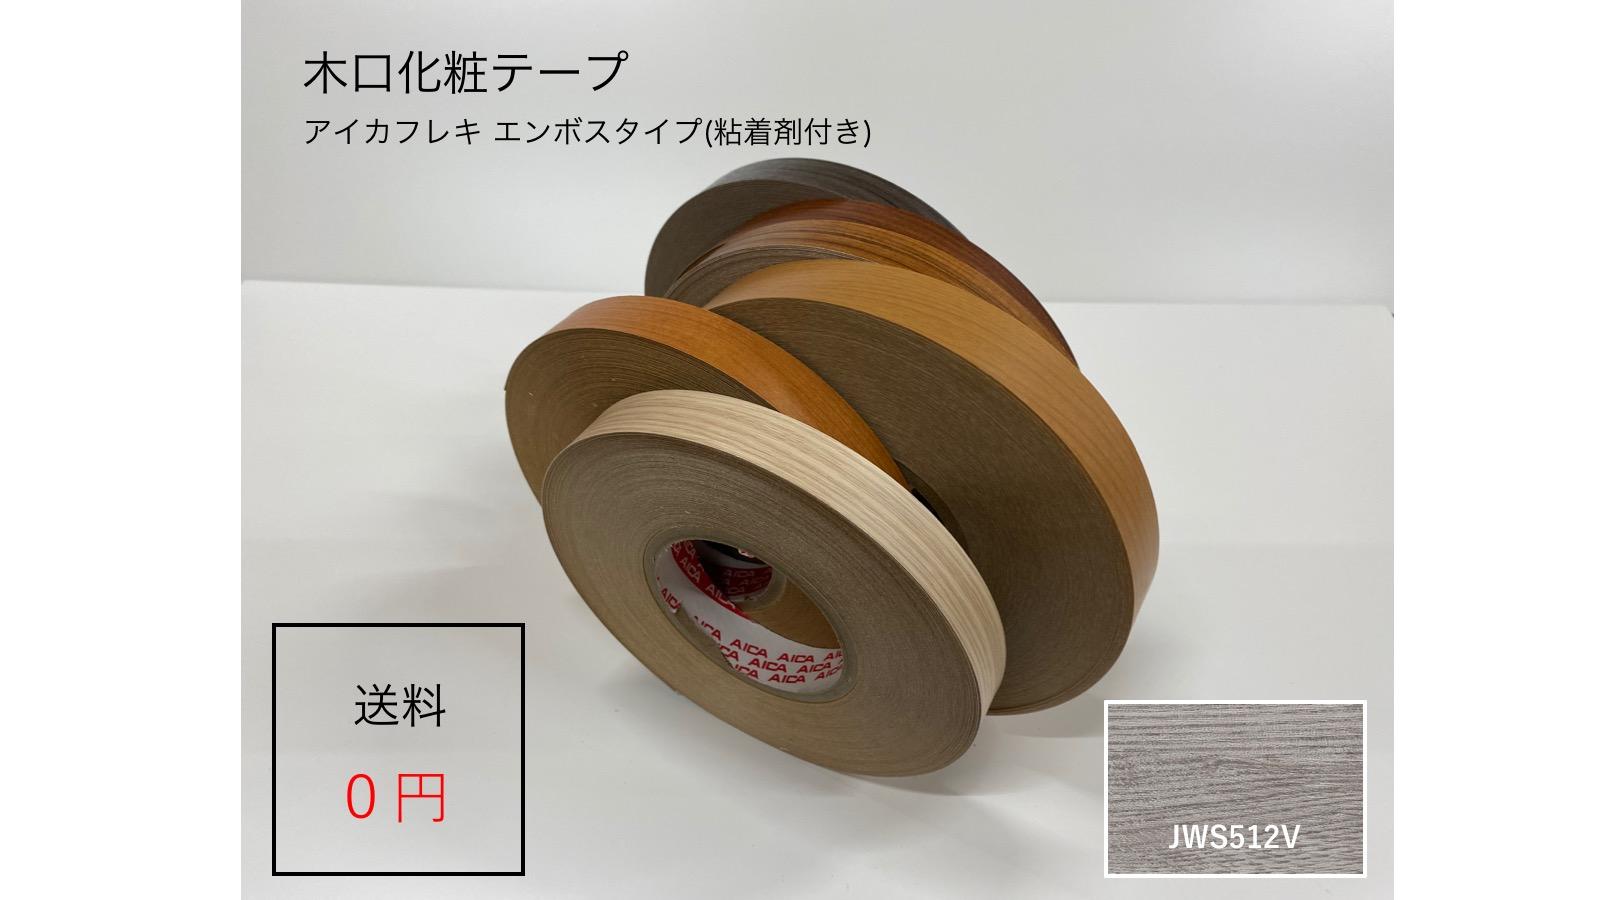 JWS512V30x50 木口テープ 木目テープ DIY AICA アイカ アイカフレキ 厚さ0.3mmx幅30mmx長さ50mアイカフレキ 粘着剤付き JWS512V 日本最大級の品揃え 完売 ダップ樹脂テープ 木目柄エンボスタイプ